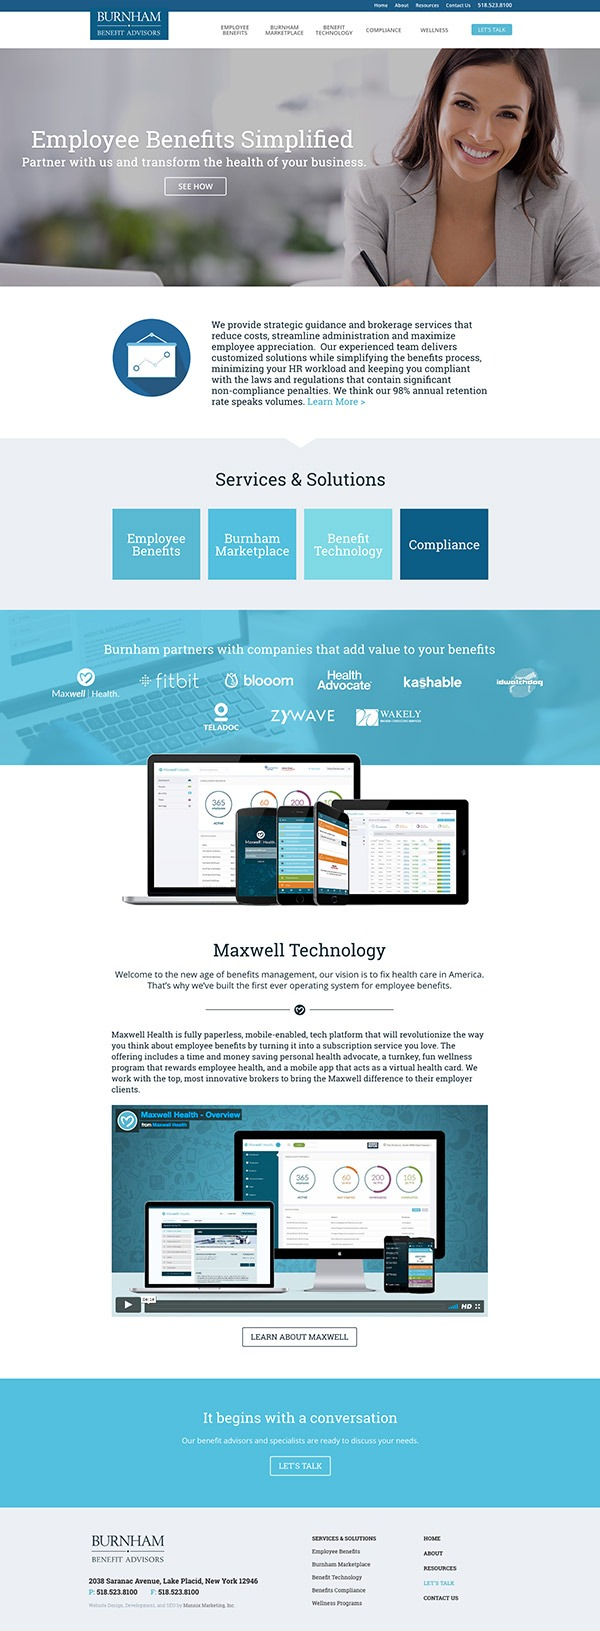 Burnham Benefit Advisors website design and development